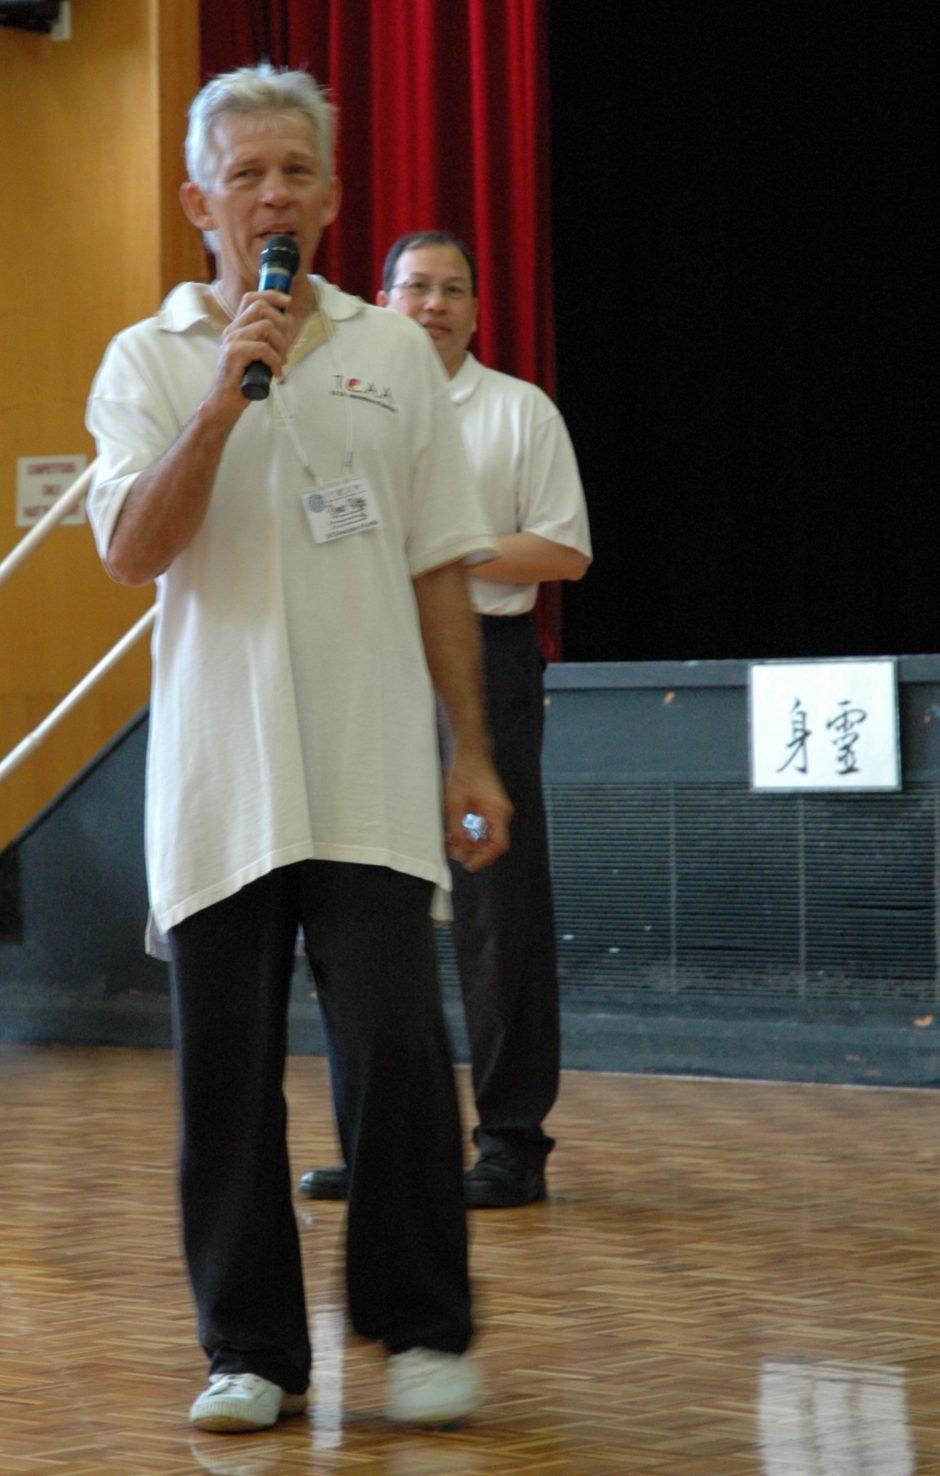 TCAA Gold Coast TCAA Comp 2006 Dennis Watts Comp Organiser Charles Sui Po Head Judge